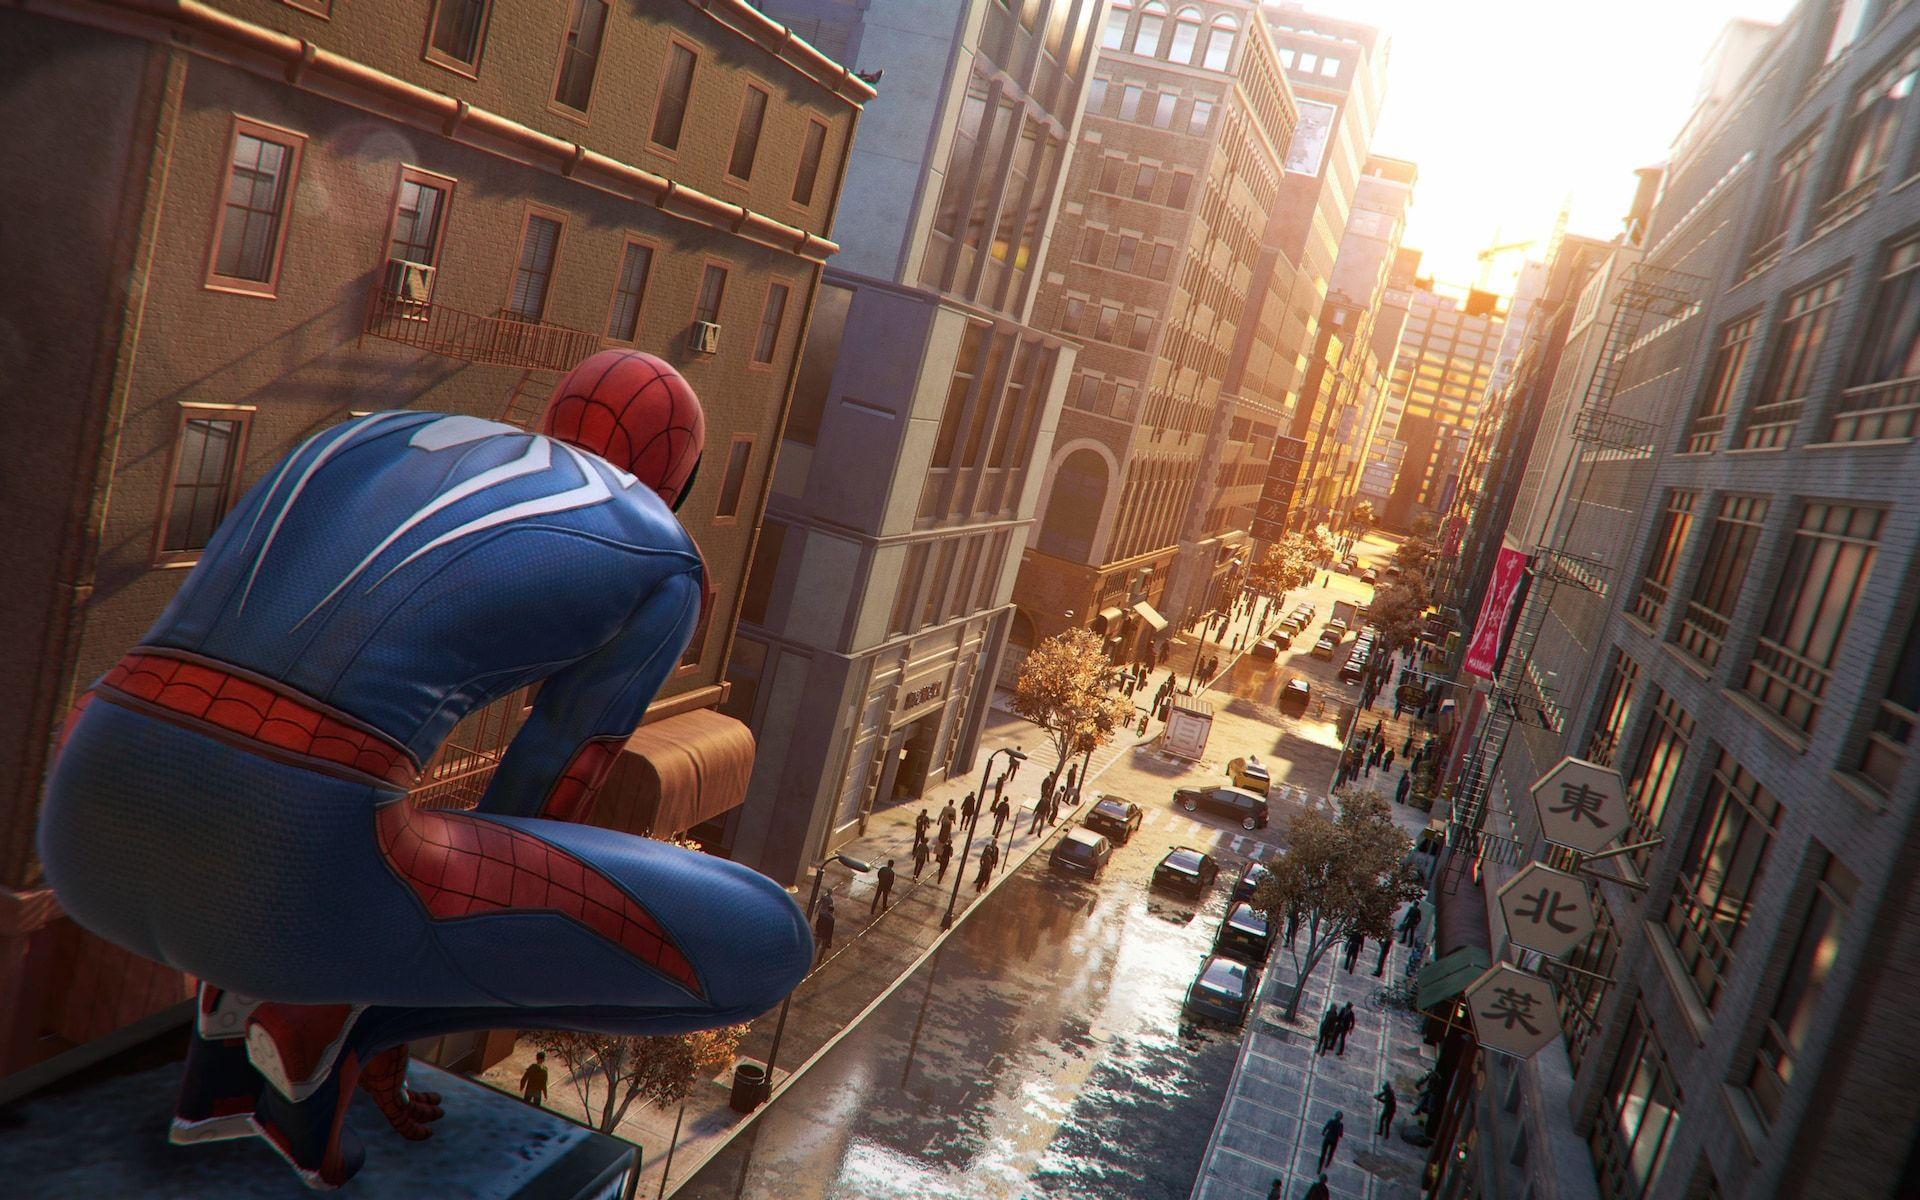 spider-man-ps4-357f5569.jpg